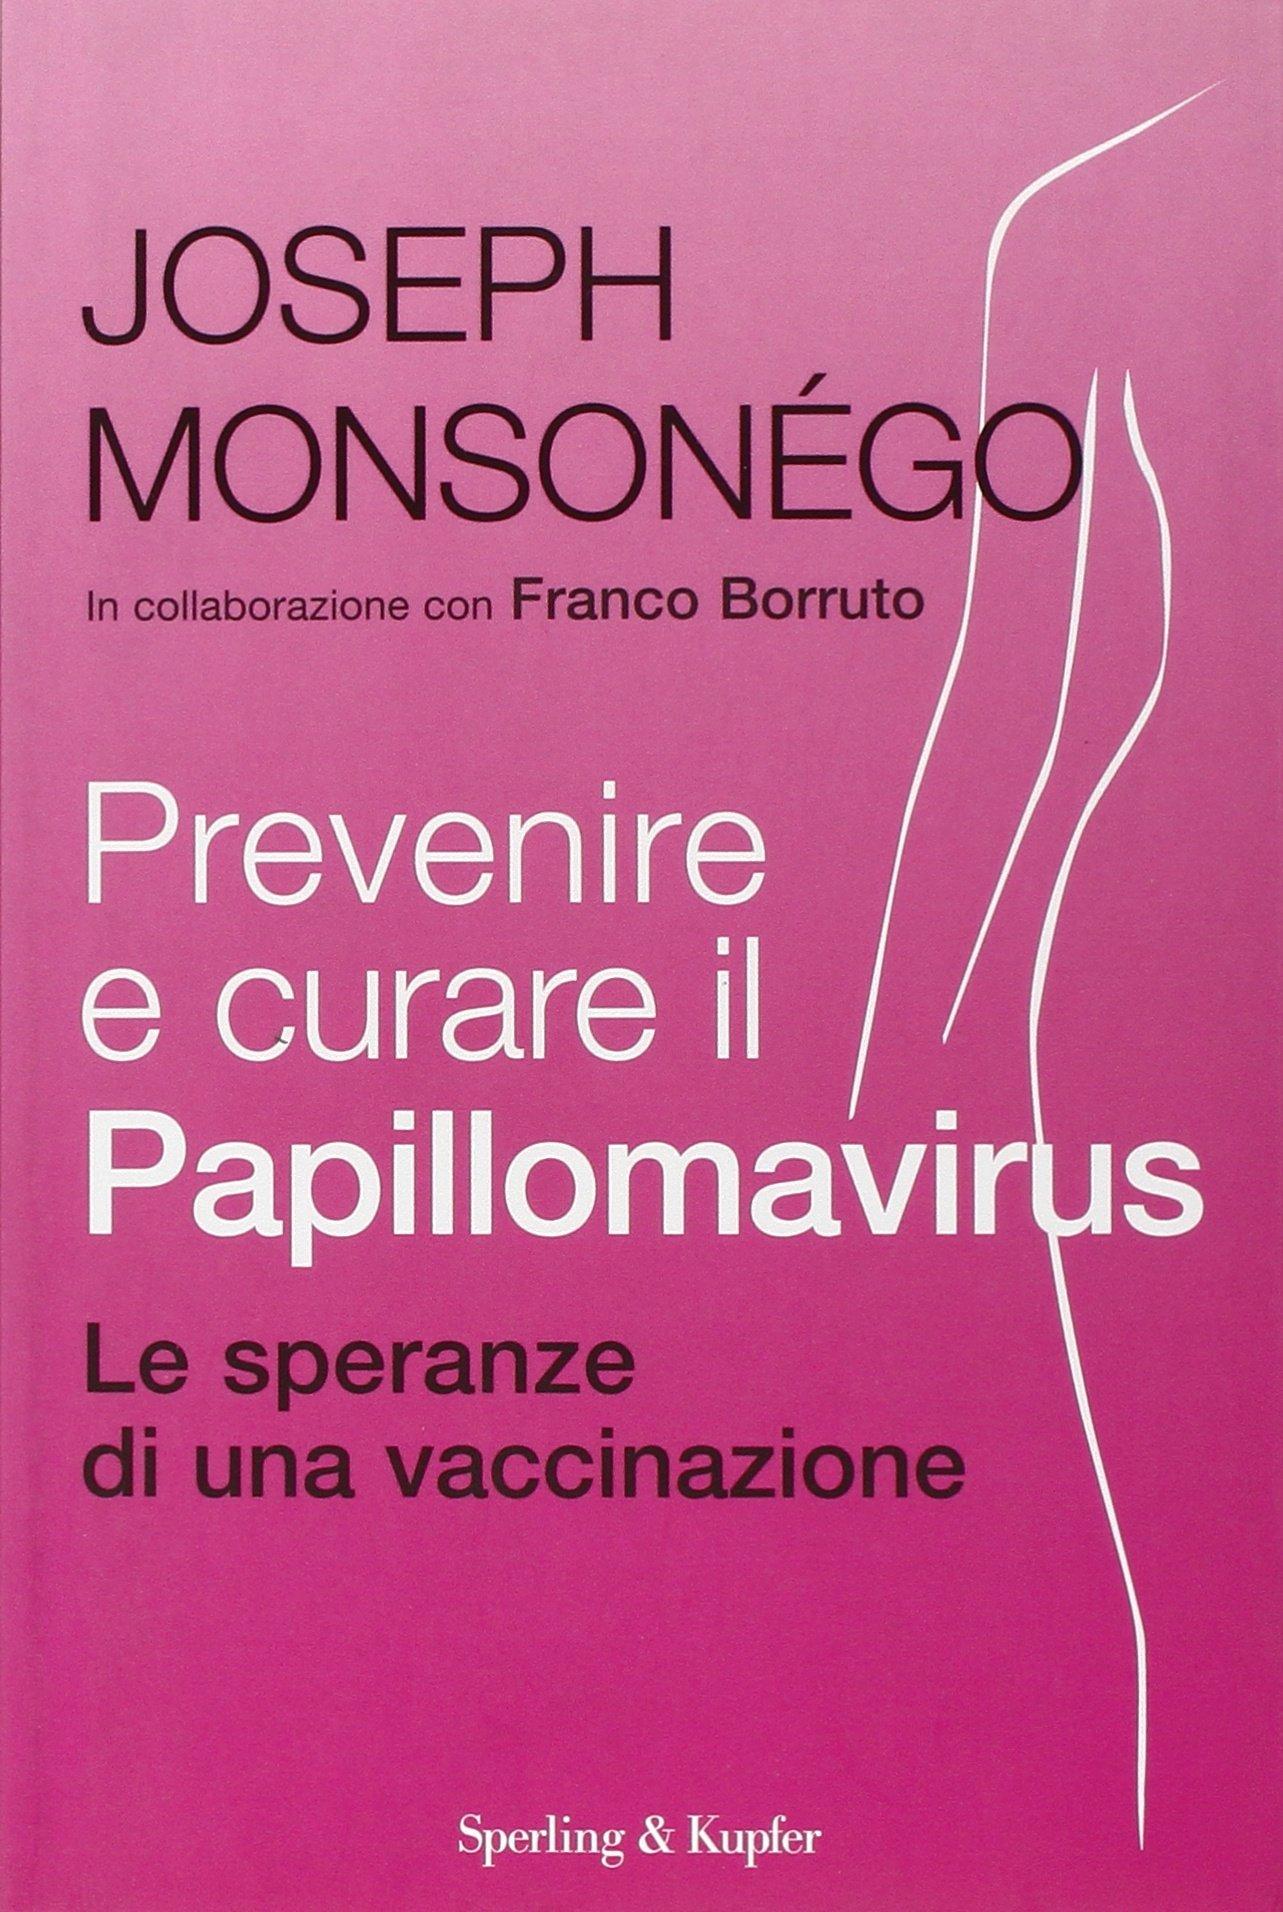 il papilloma virus e mortale